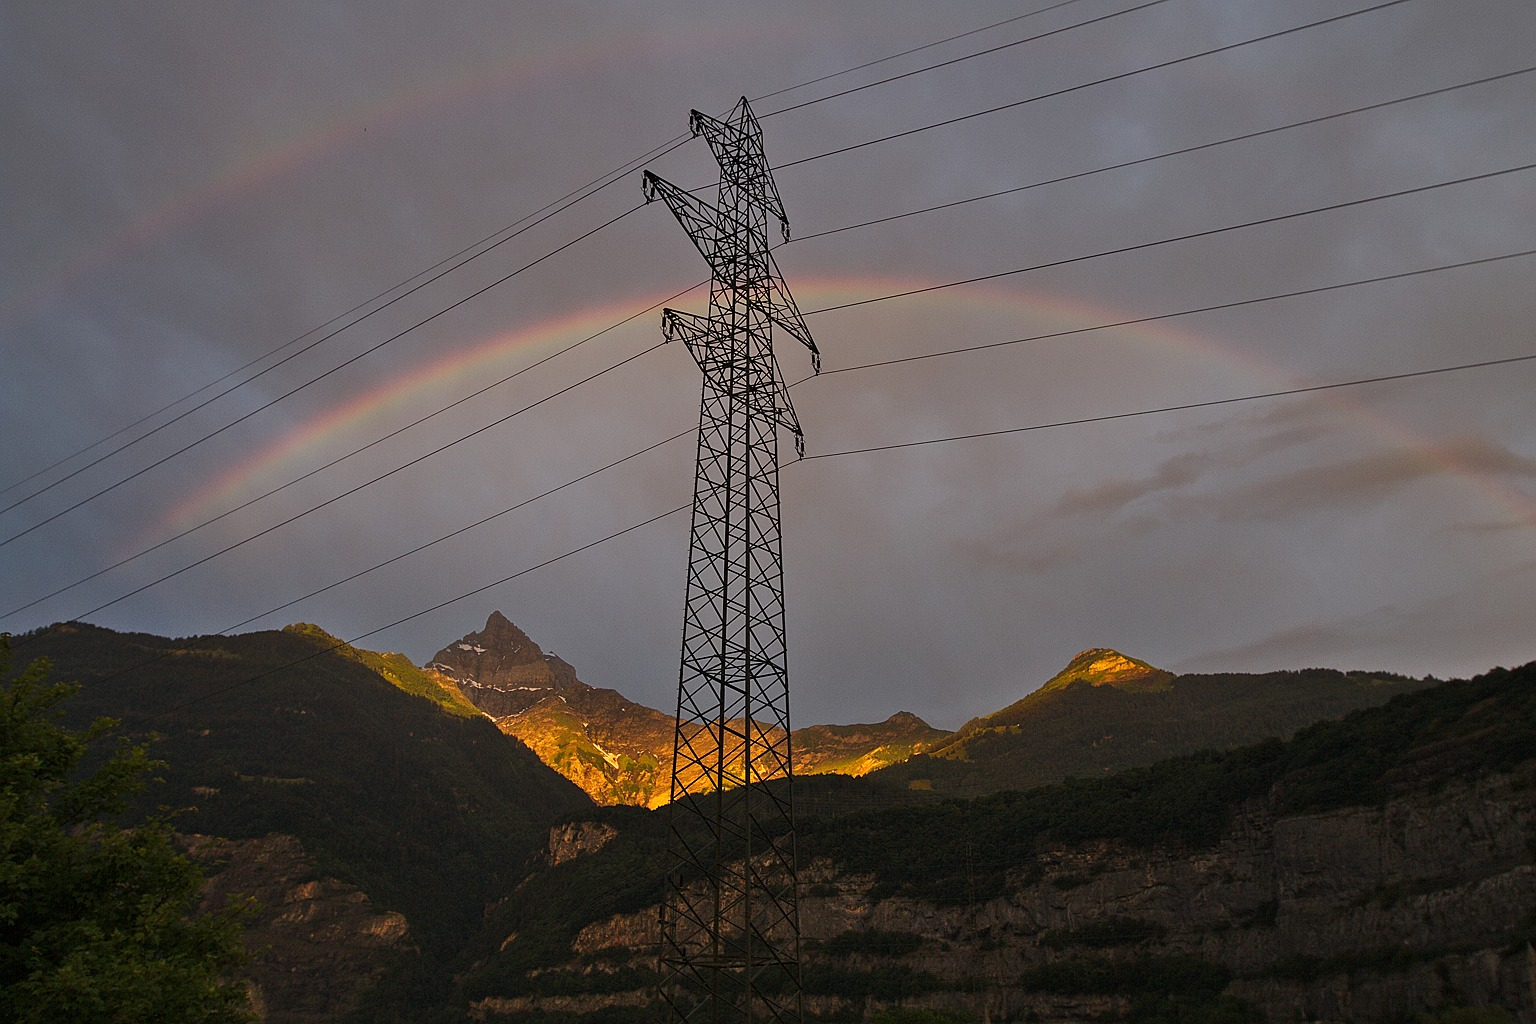 180705_0333 - Dents Du Midi - Rainbow